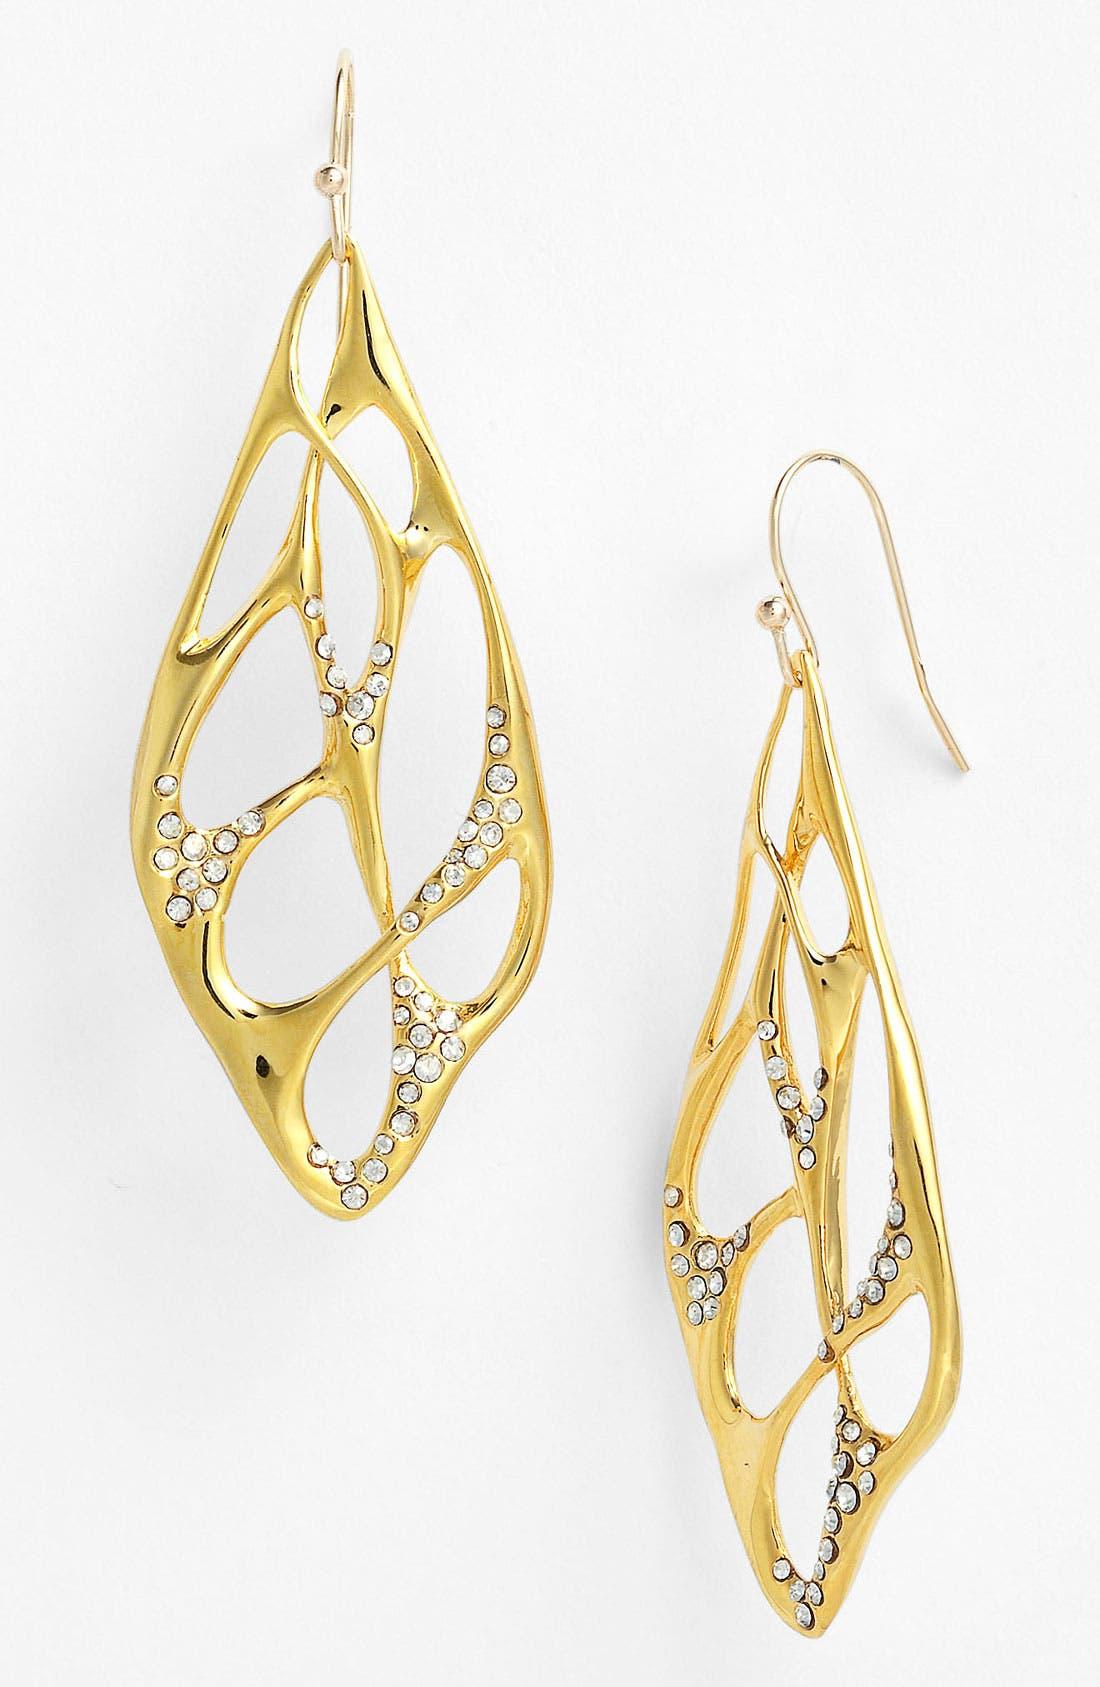 Main Image - Alexis Bittar 'Miss Havisham - Liquid Gold' Open Drop Earrings